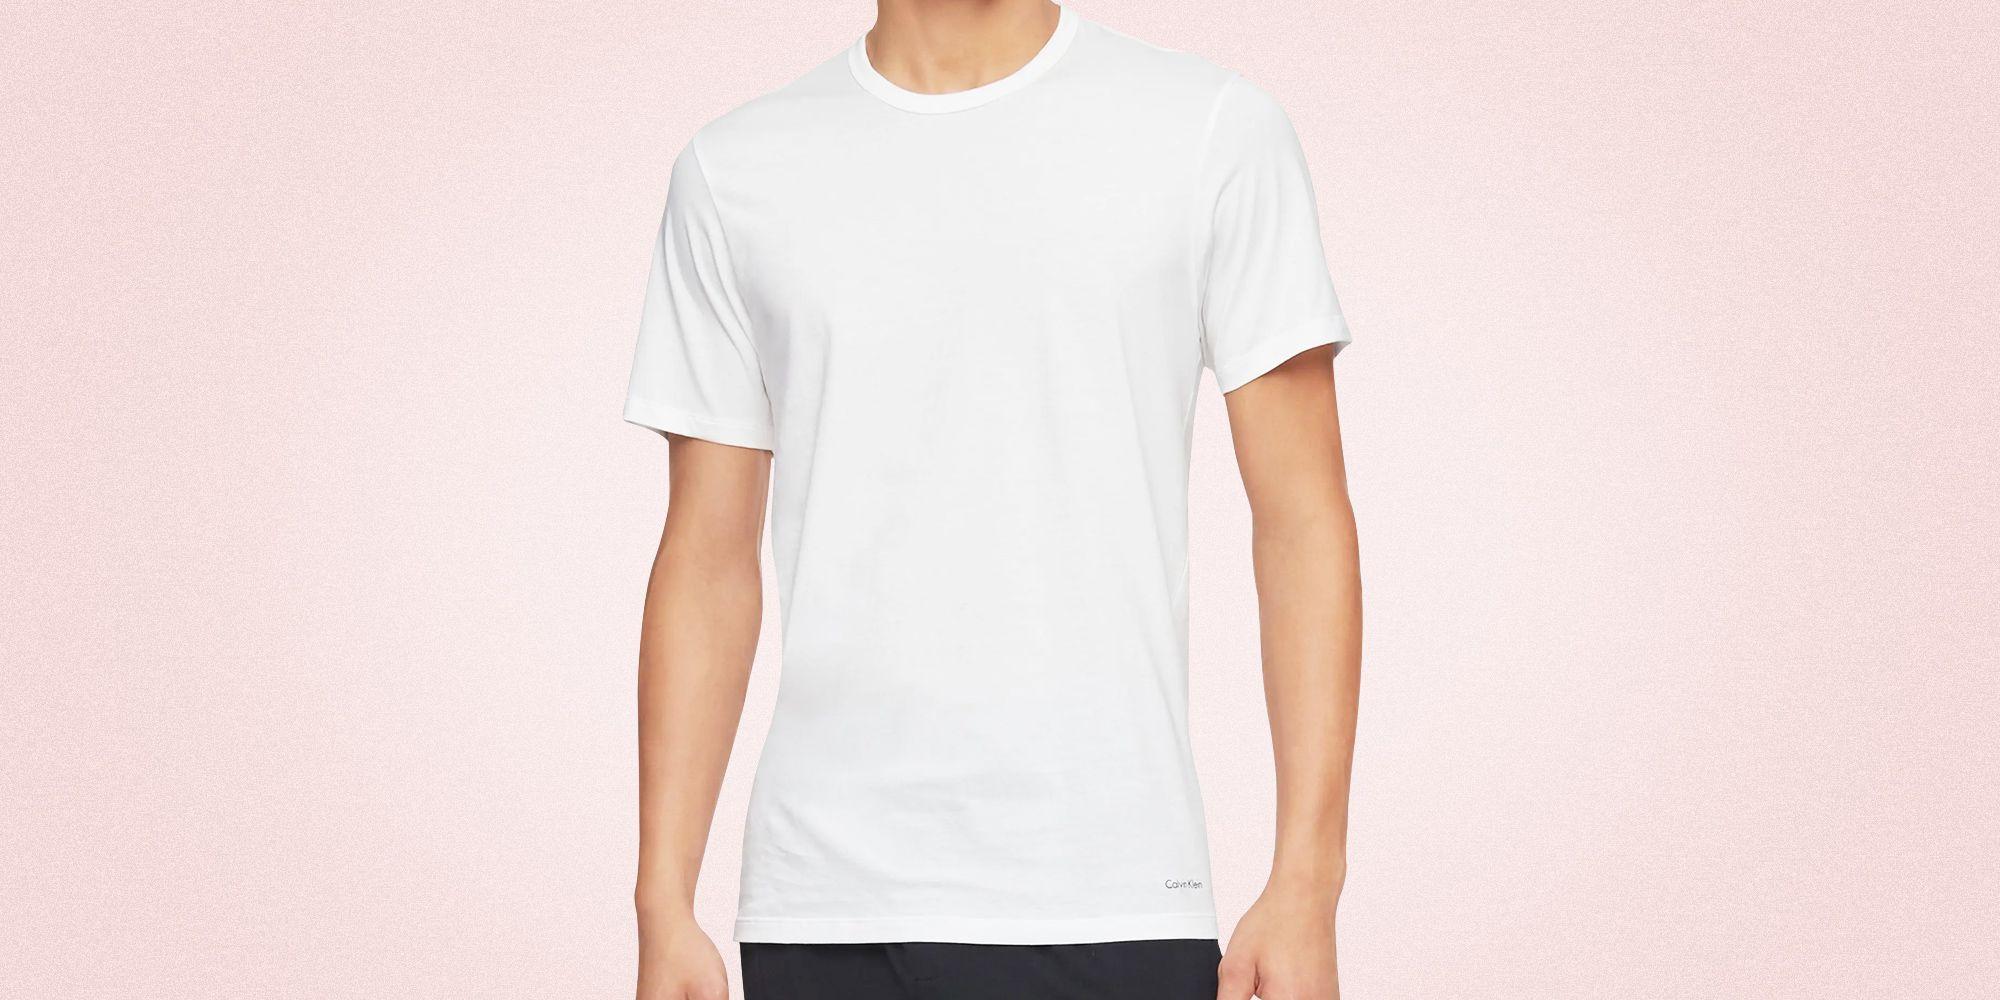 mens slimming undershirt în magazin)